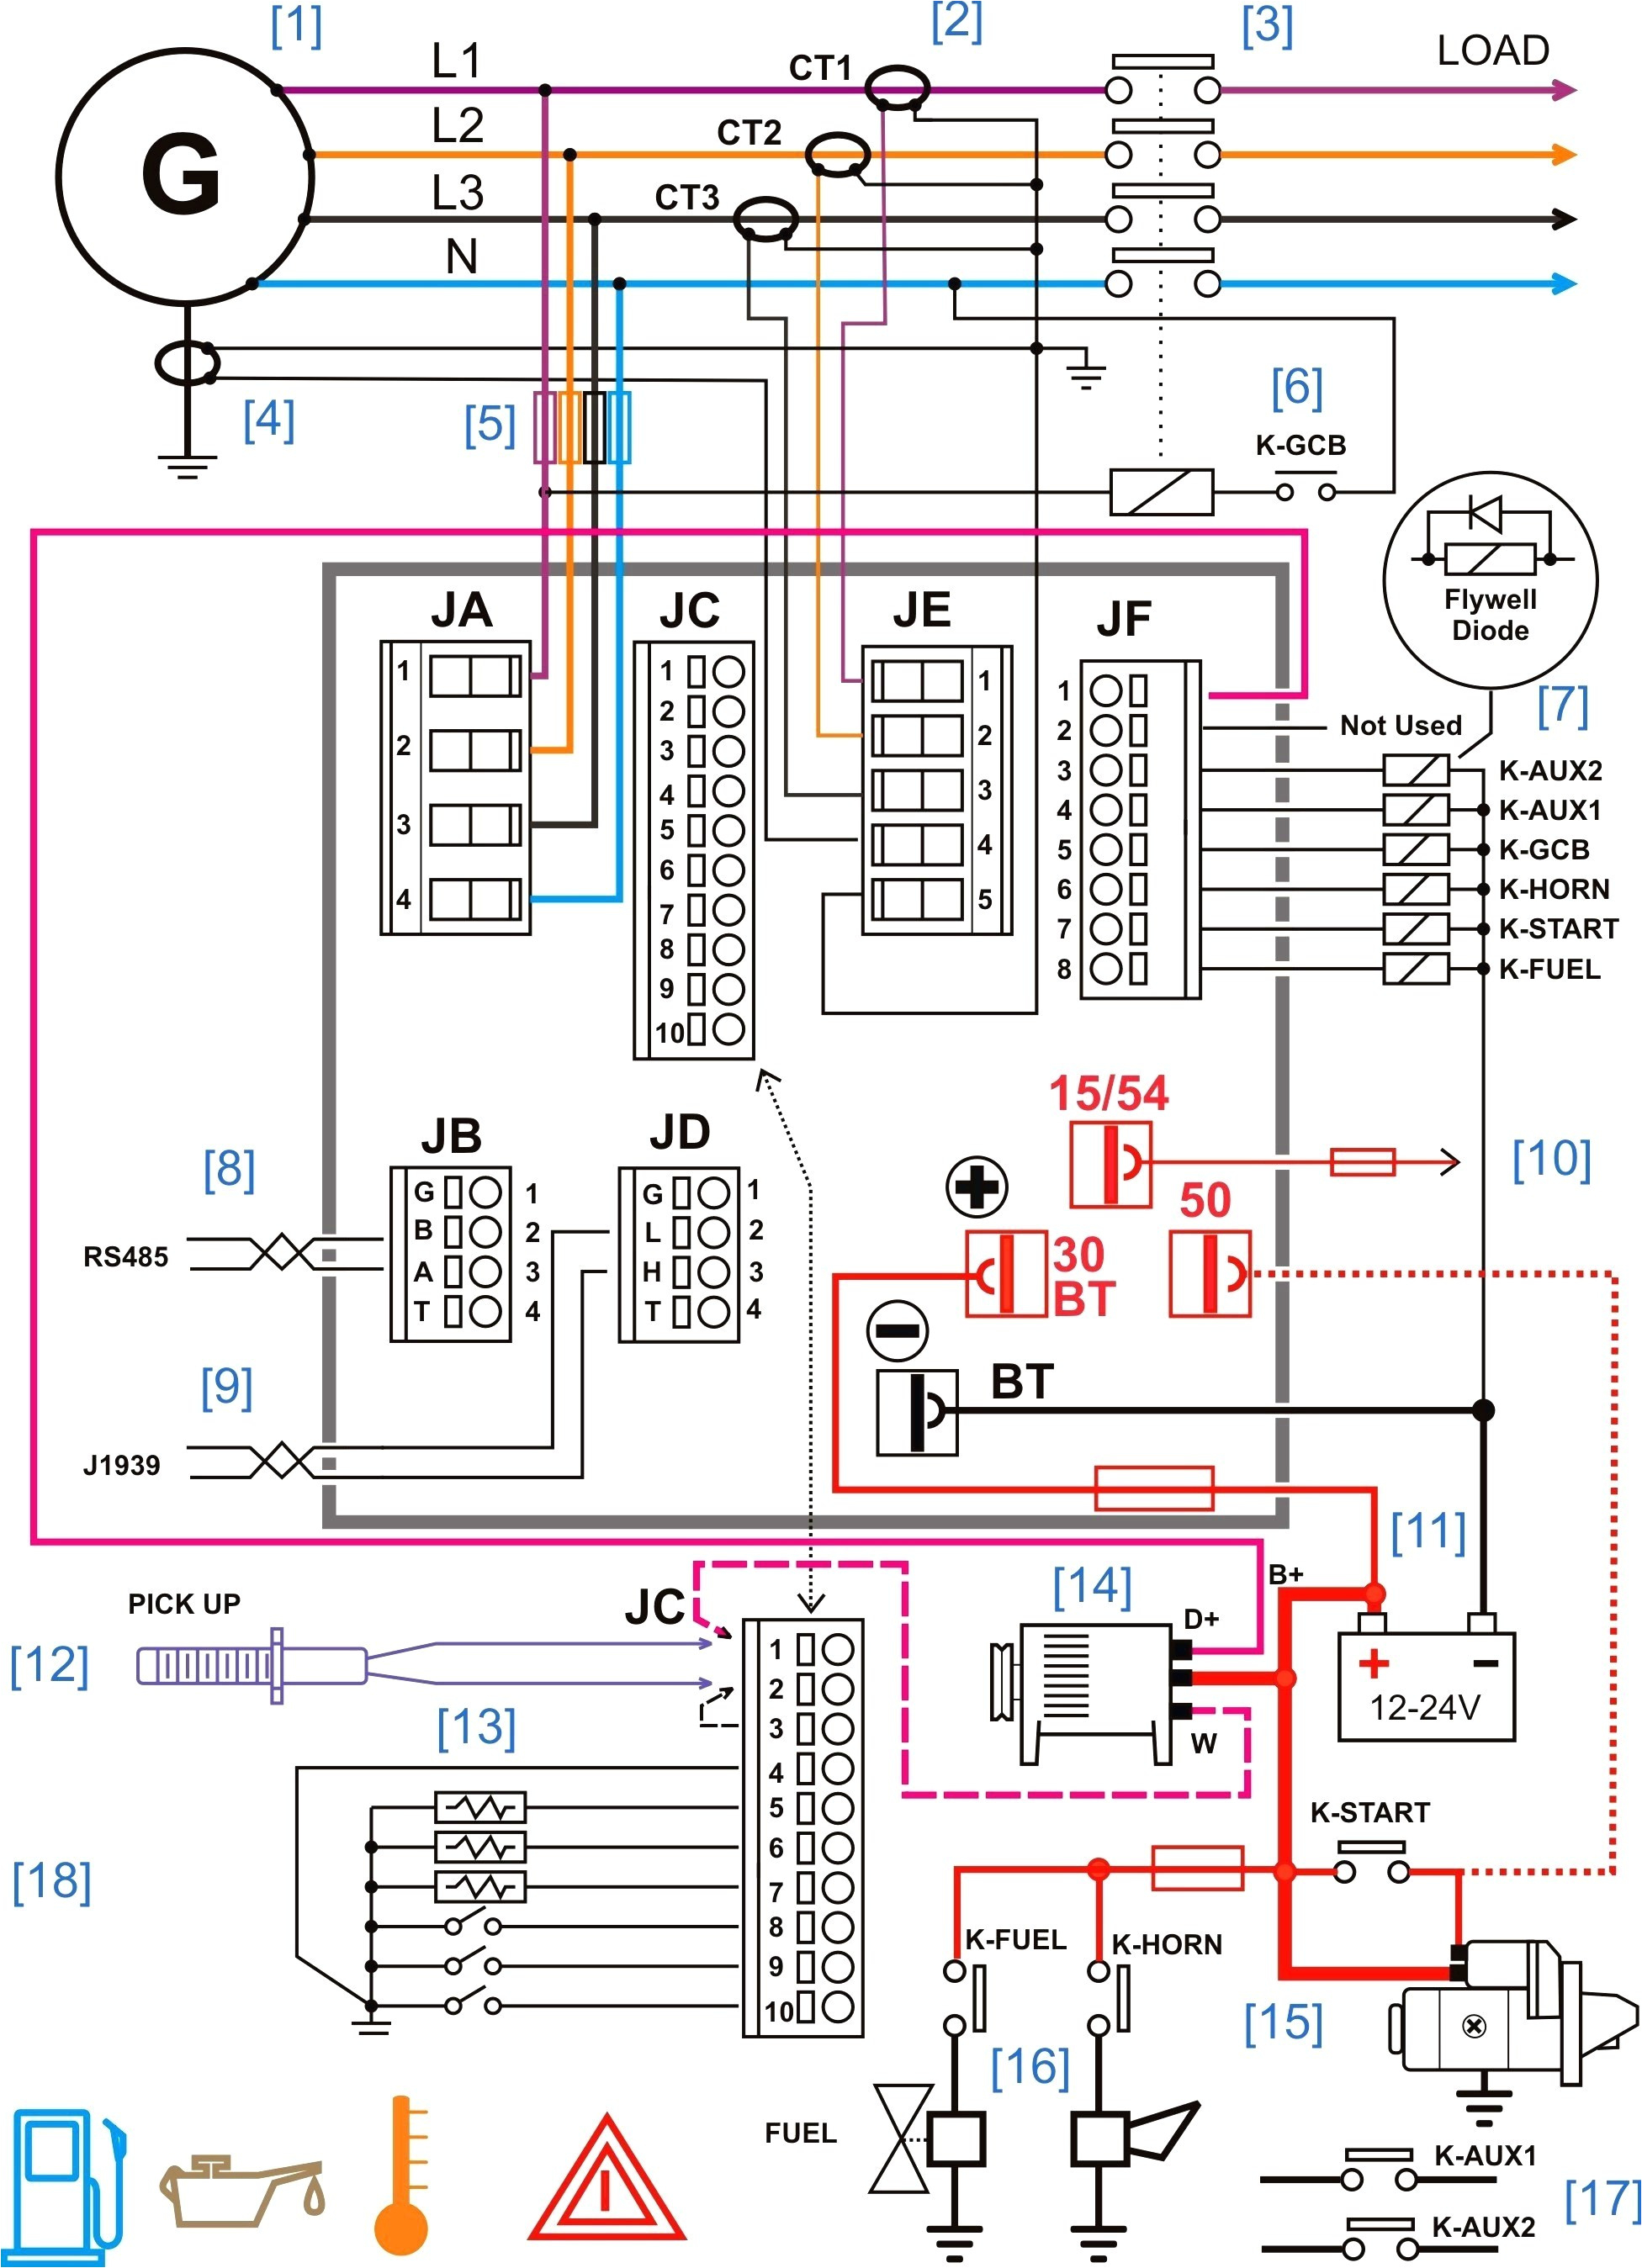 basic auto wiring diagram fresh wiring harness diagram book car stereo wiring diagrams 0d